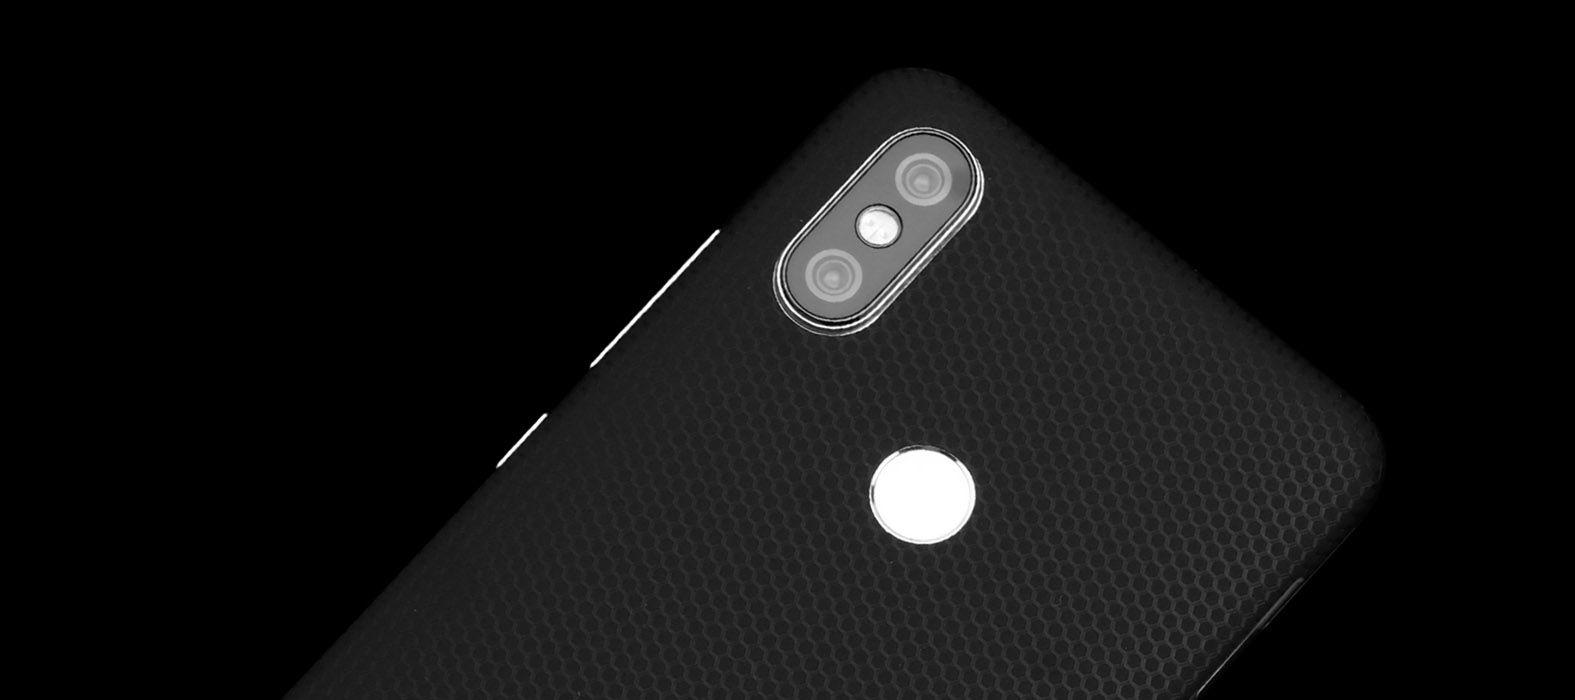 Xiaomi Redmi 6 Pro Black Matrix Skins